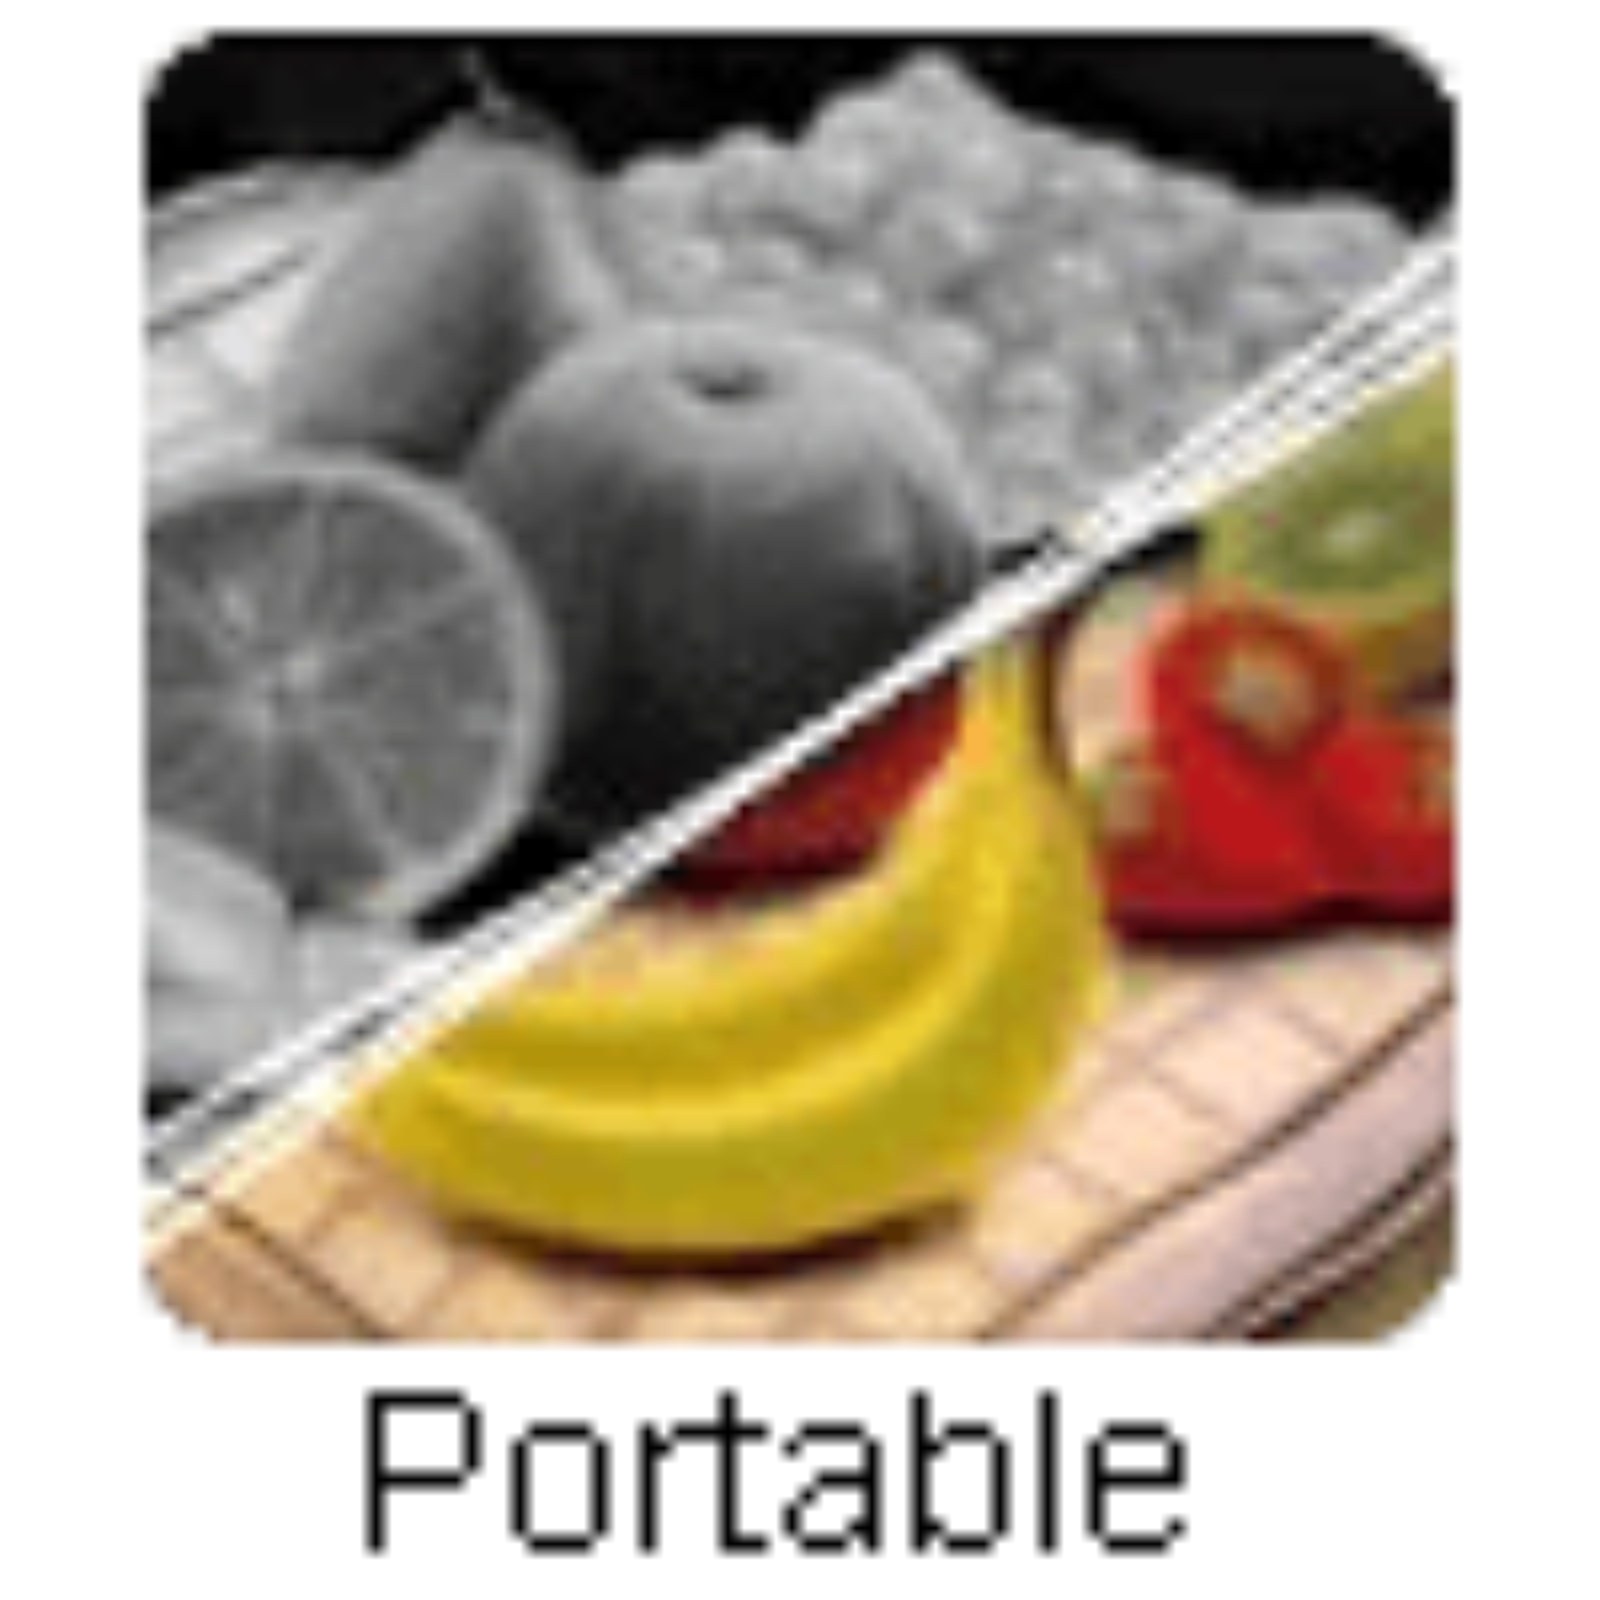 PhotoFiltre Portable 7.0.1